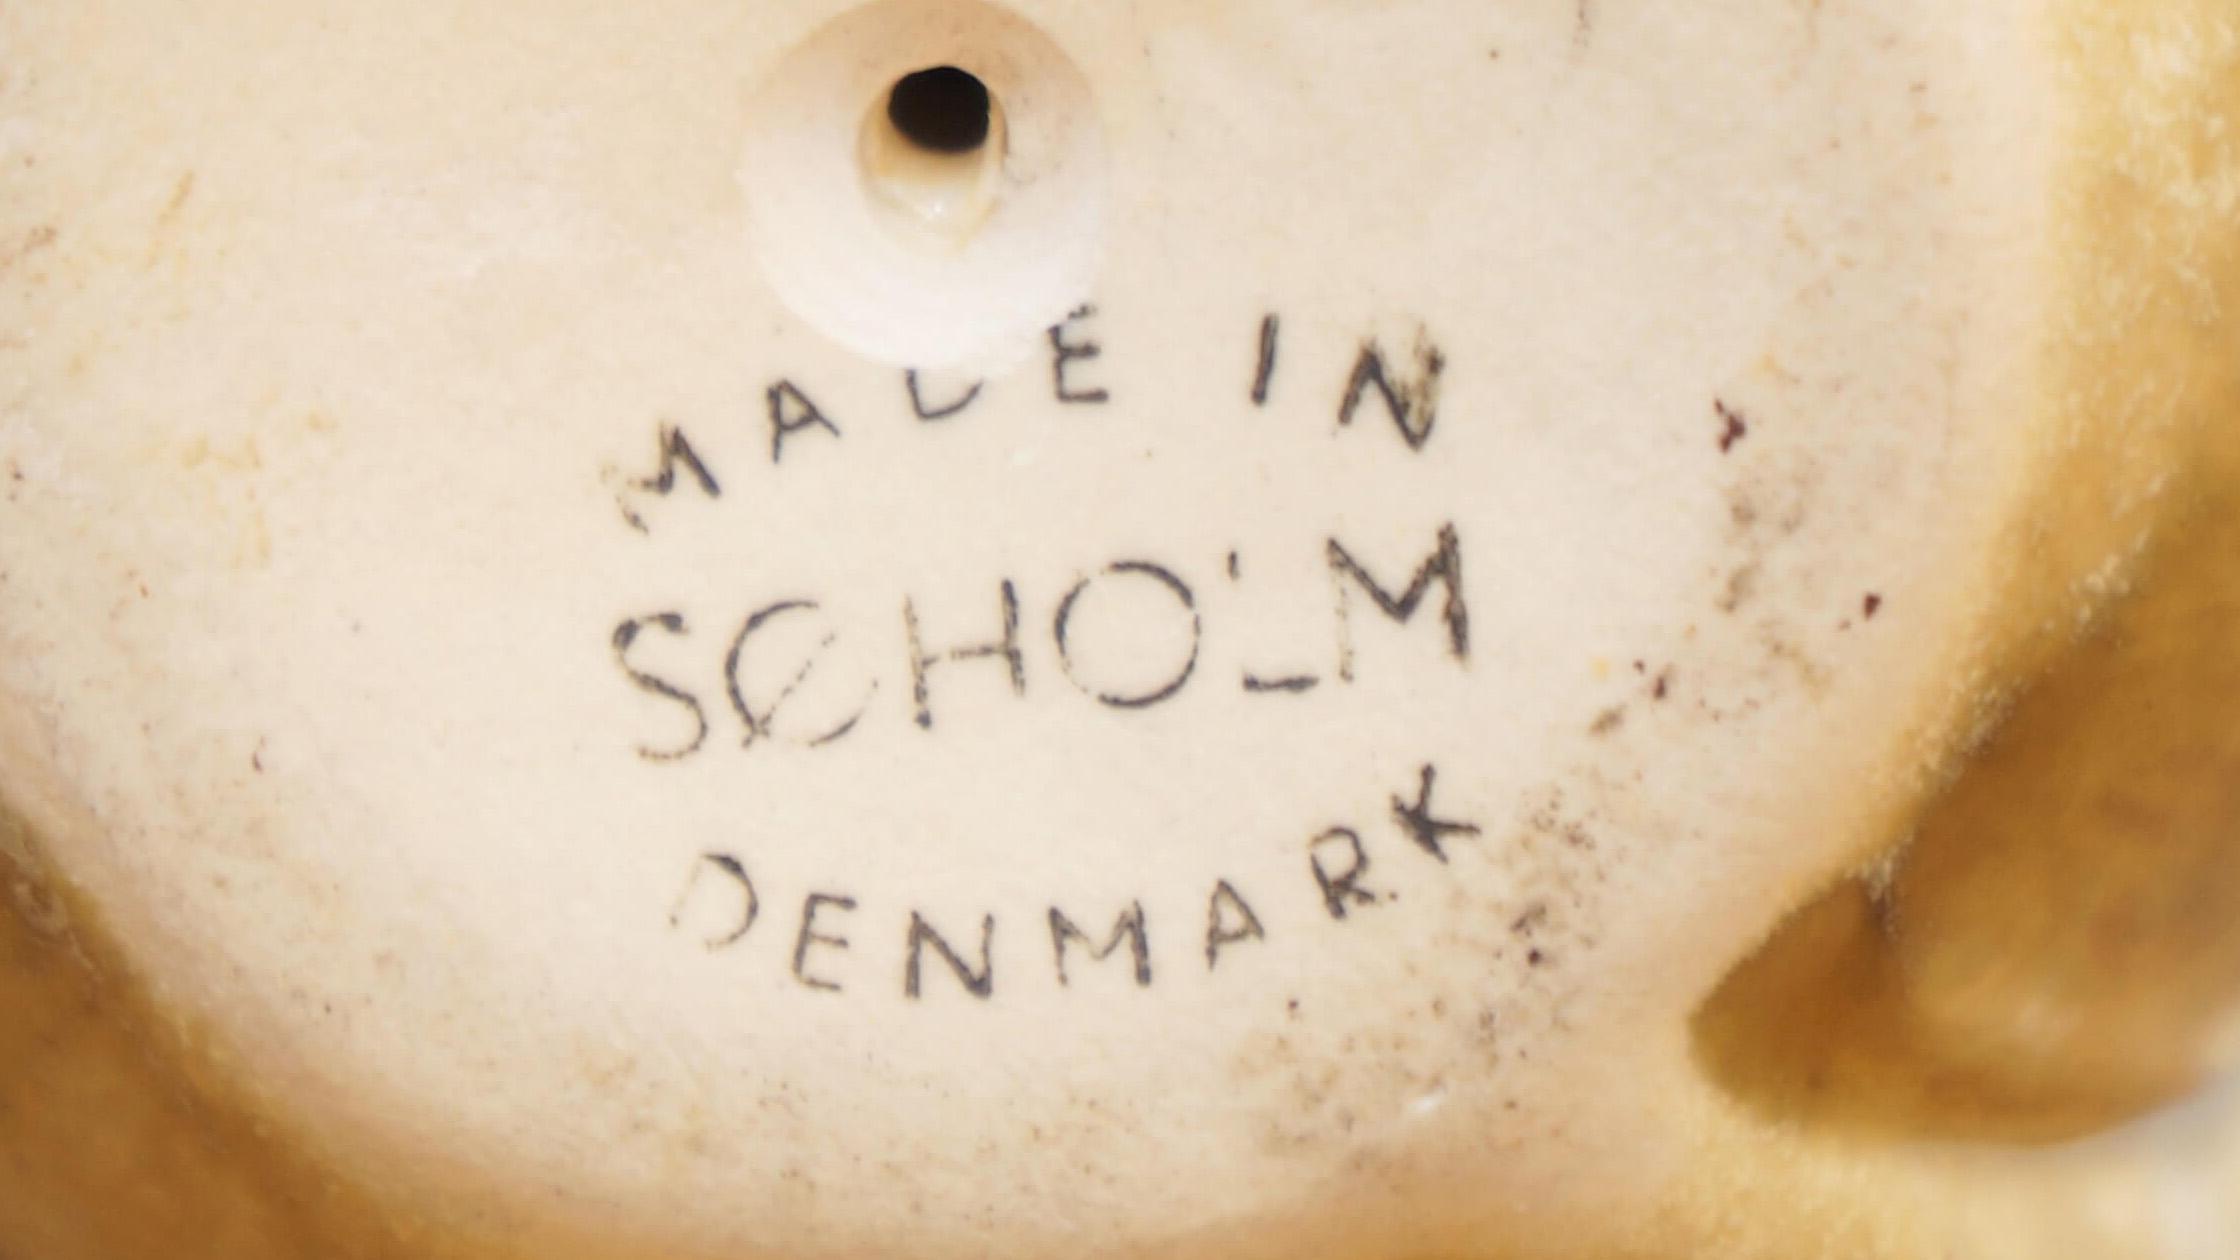 SOHOLM Elephant Figurine Denmark/スーホルム 象の置物 デンマーク